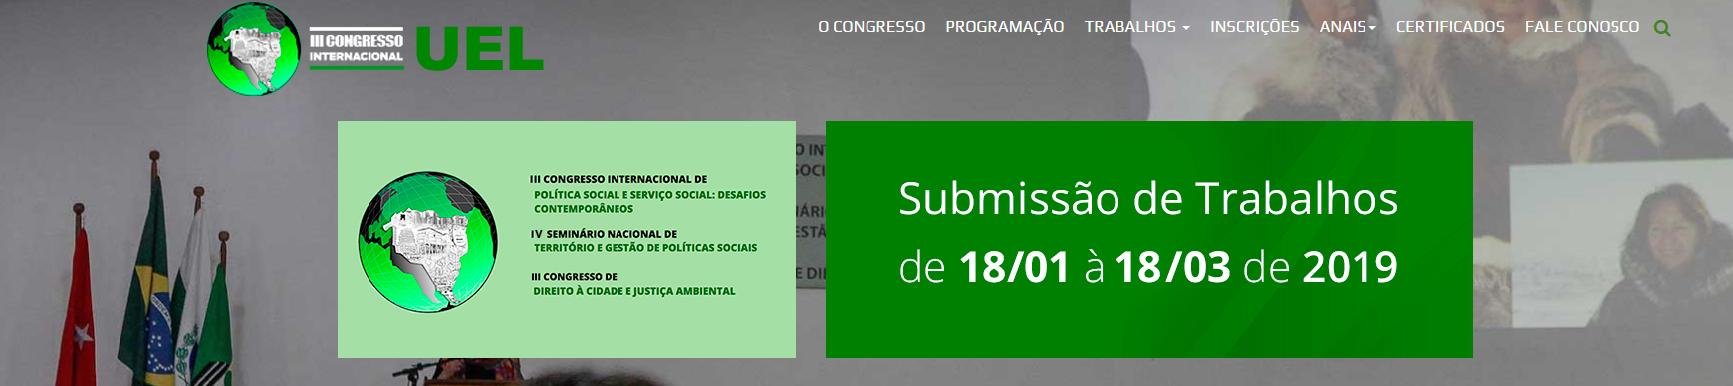 III CONGRESSO INTERNACIONAL DE POLÍTICA SOCIAL E SERVIÇO SOCIAL